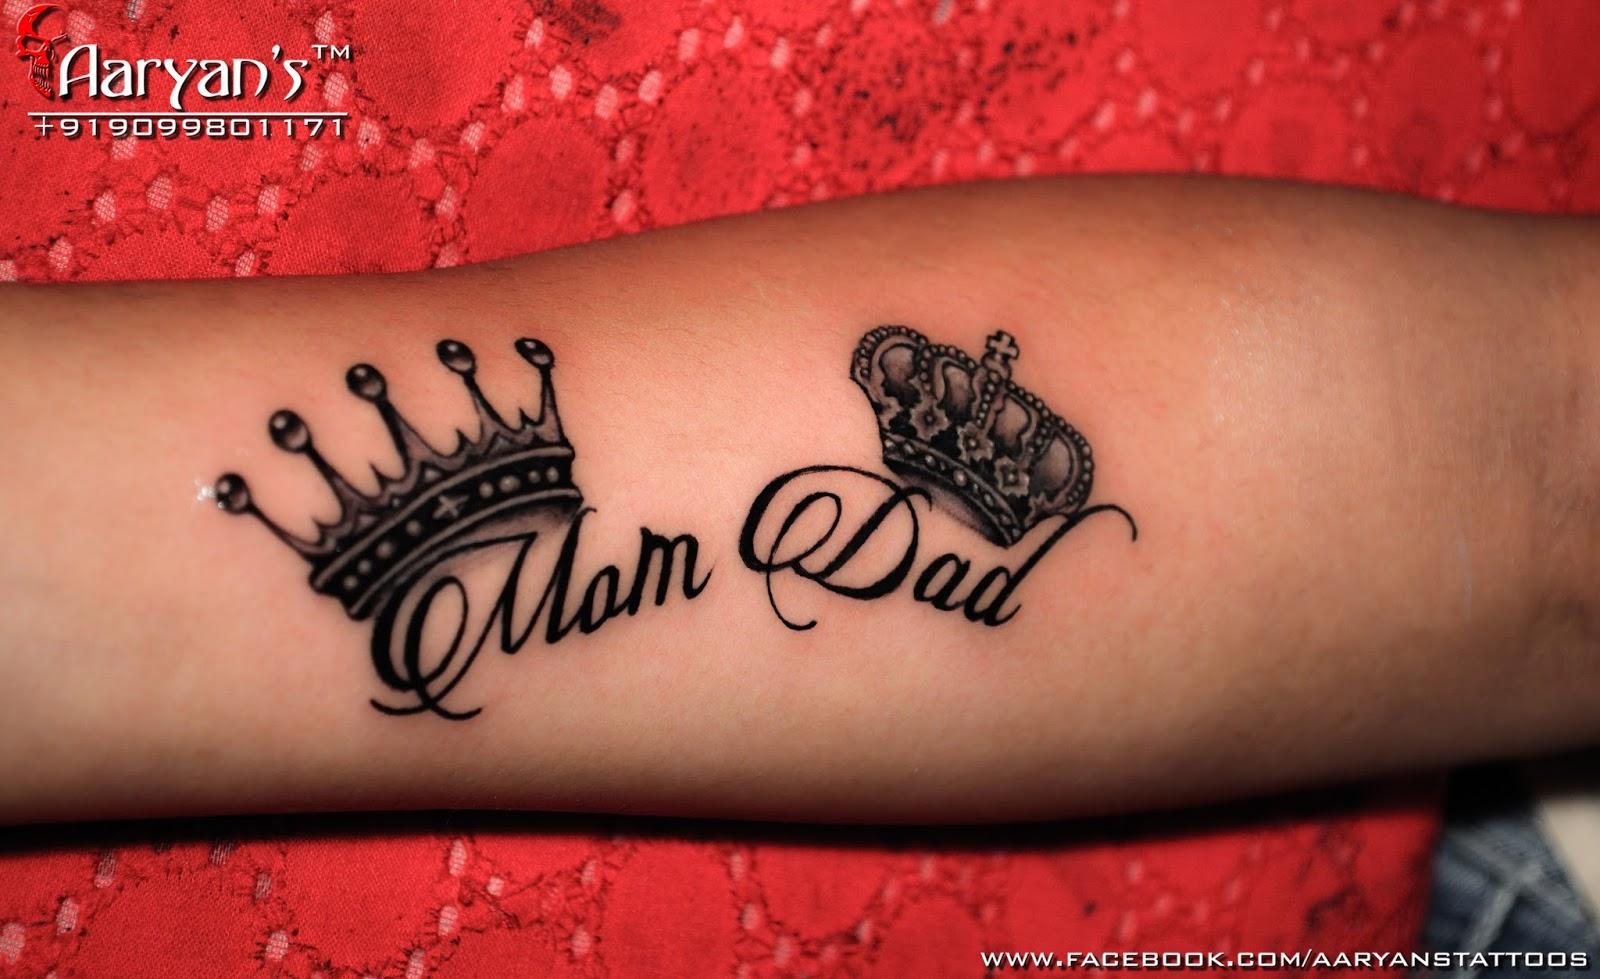 Mom Dad Tattoos Awesome Tattoos For Mom Dad By Aaryan Tattooist